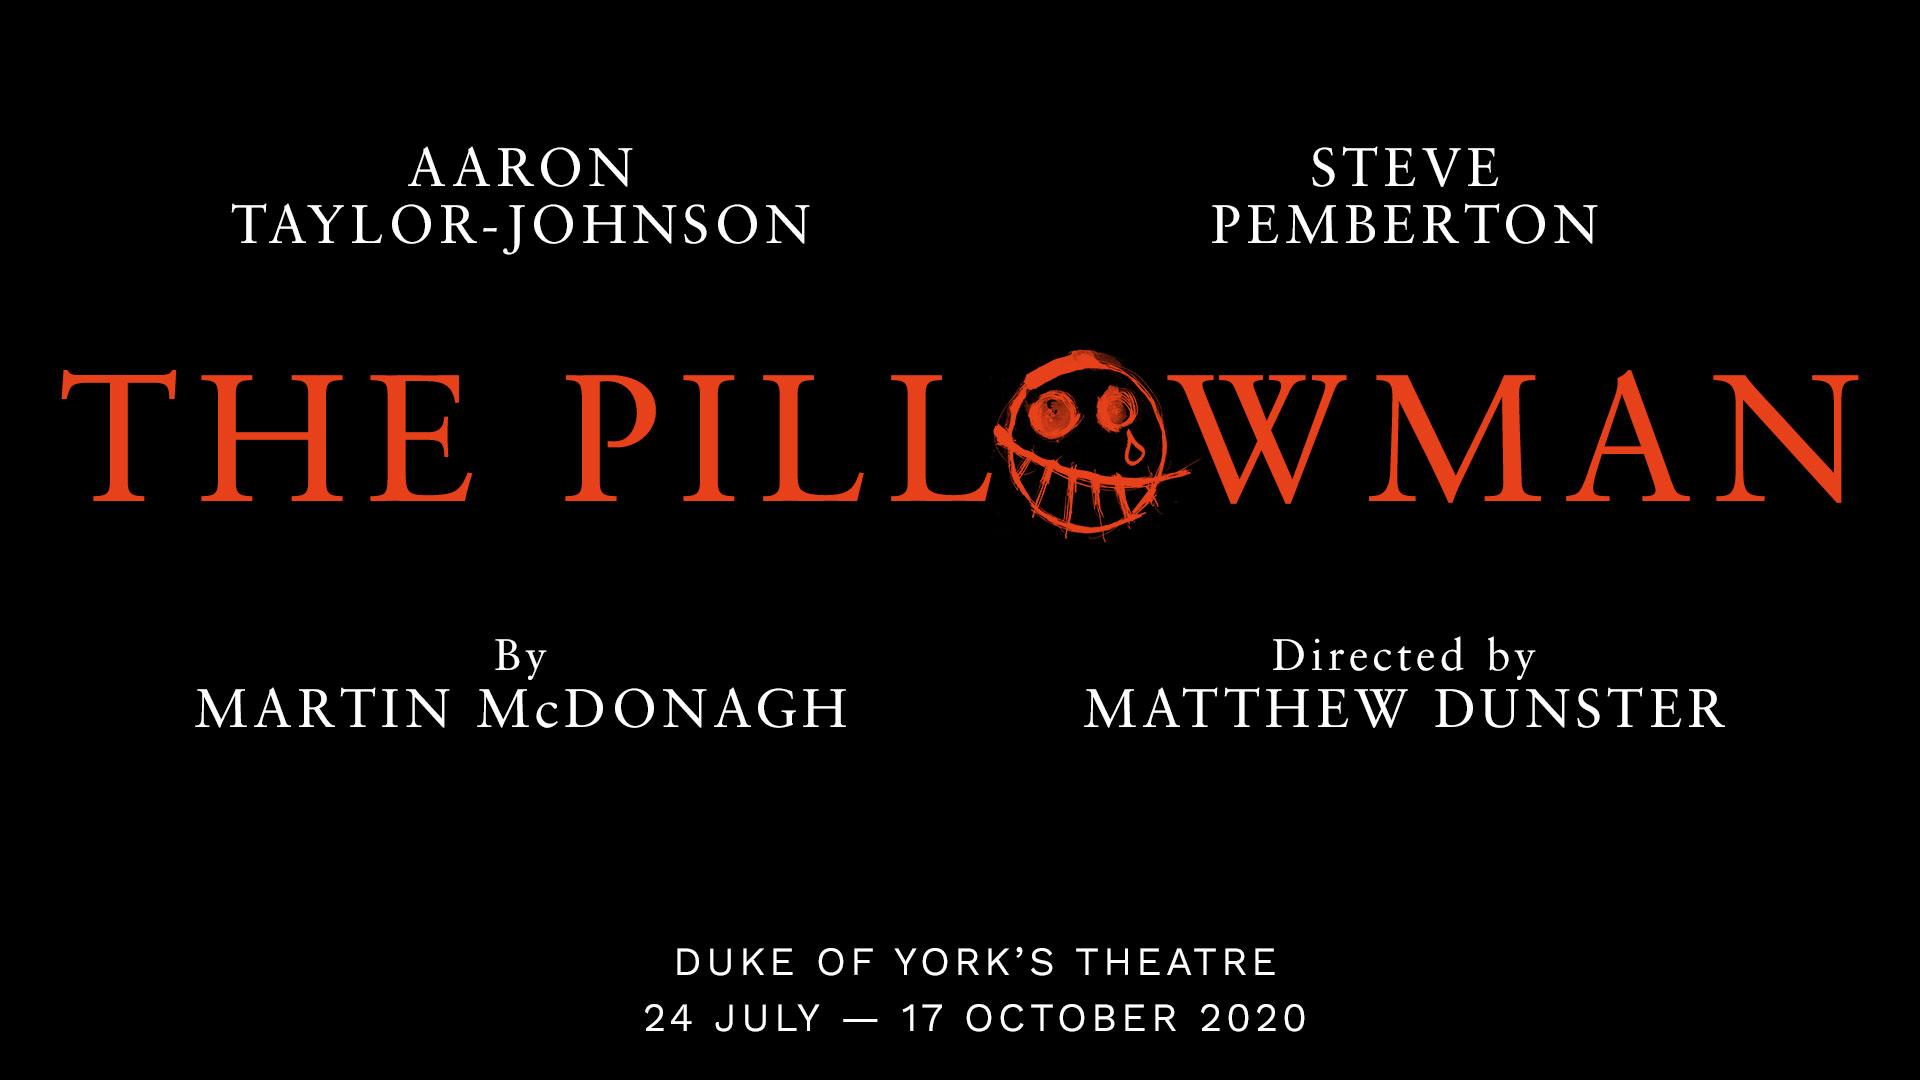 Title artwork for The Pillowman